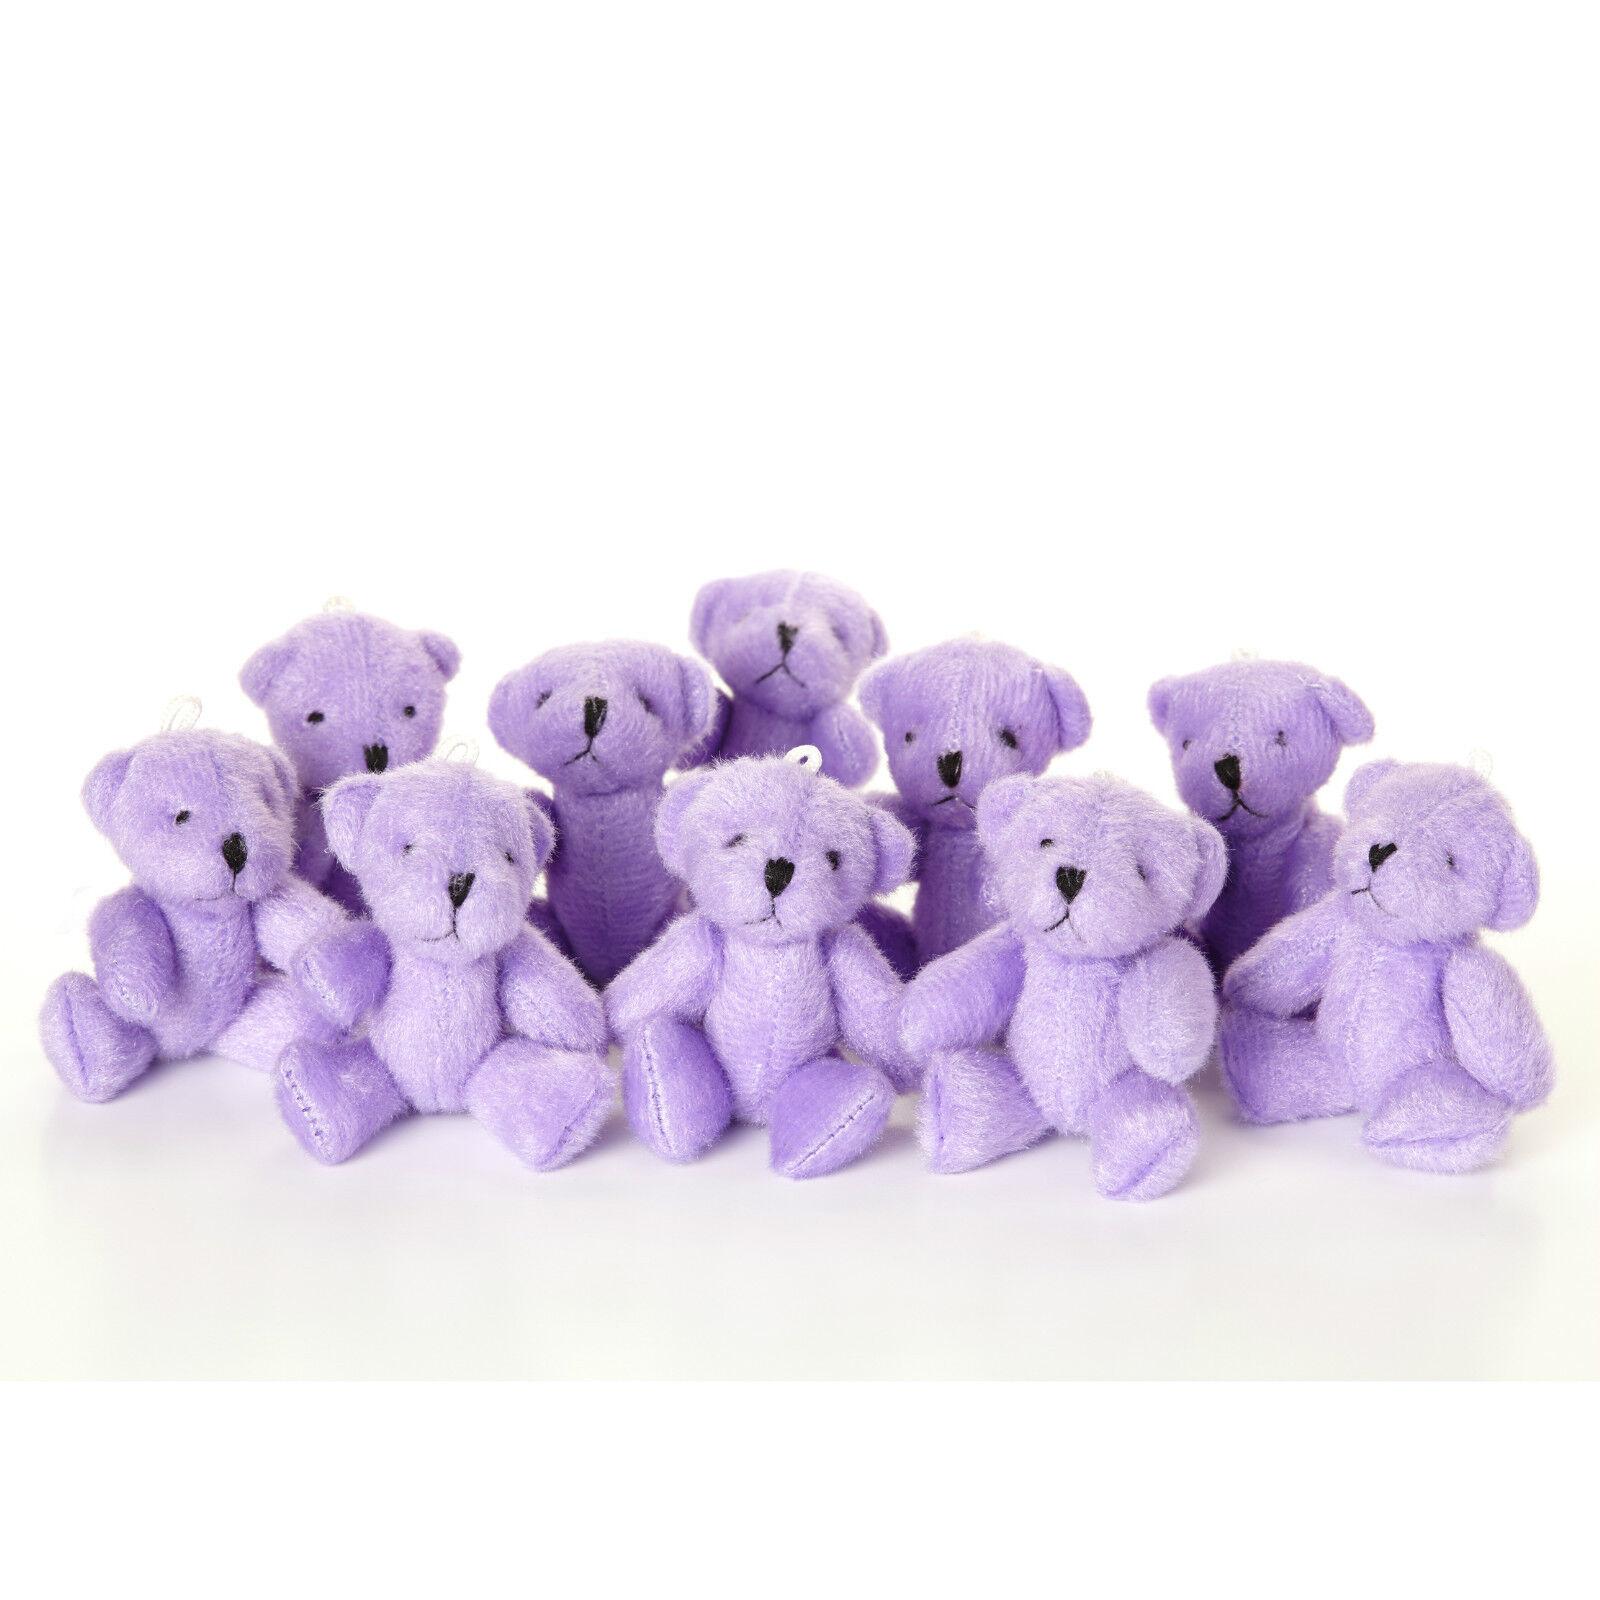 NEW - lila Teddy Bears - - - Small Cute And Cuddly  - Gift Present Birthday Xmas 250bcb